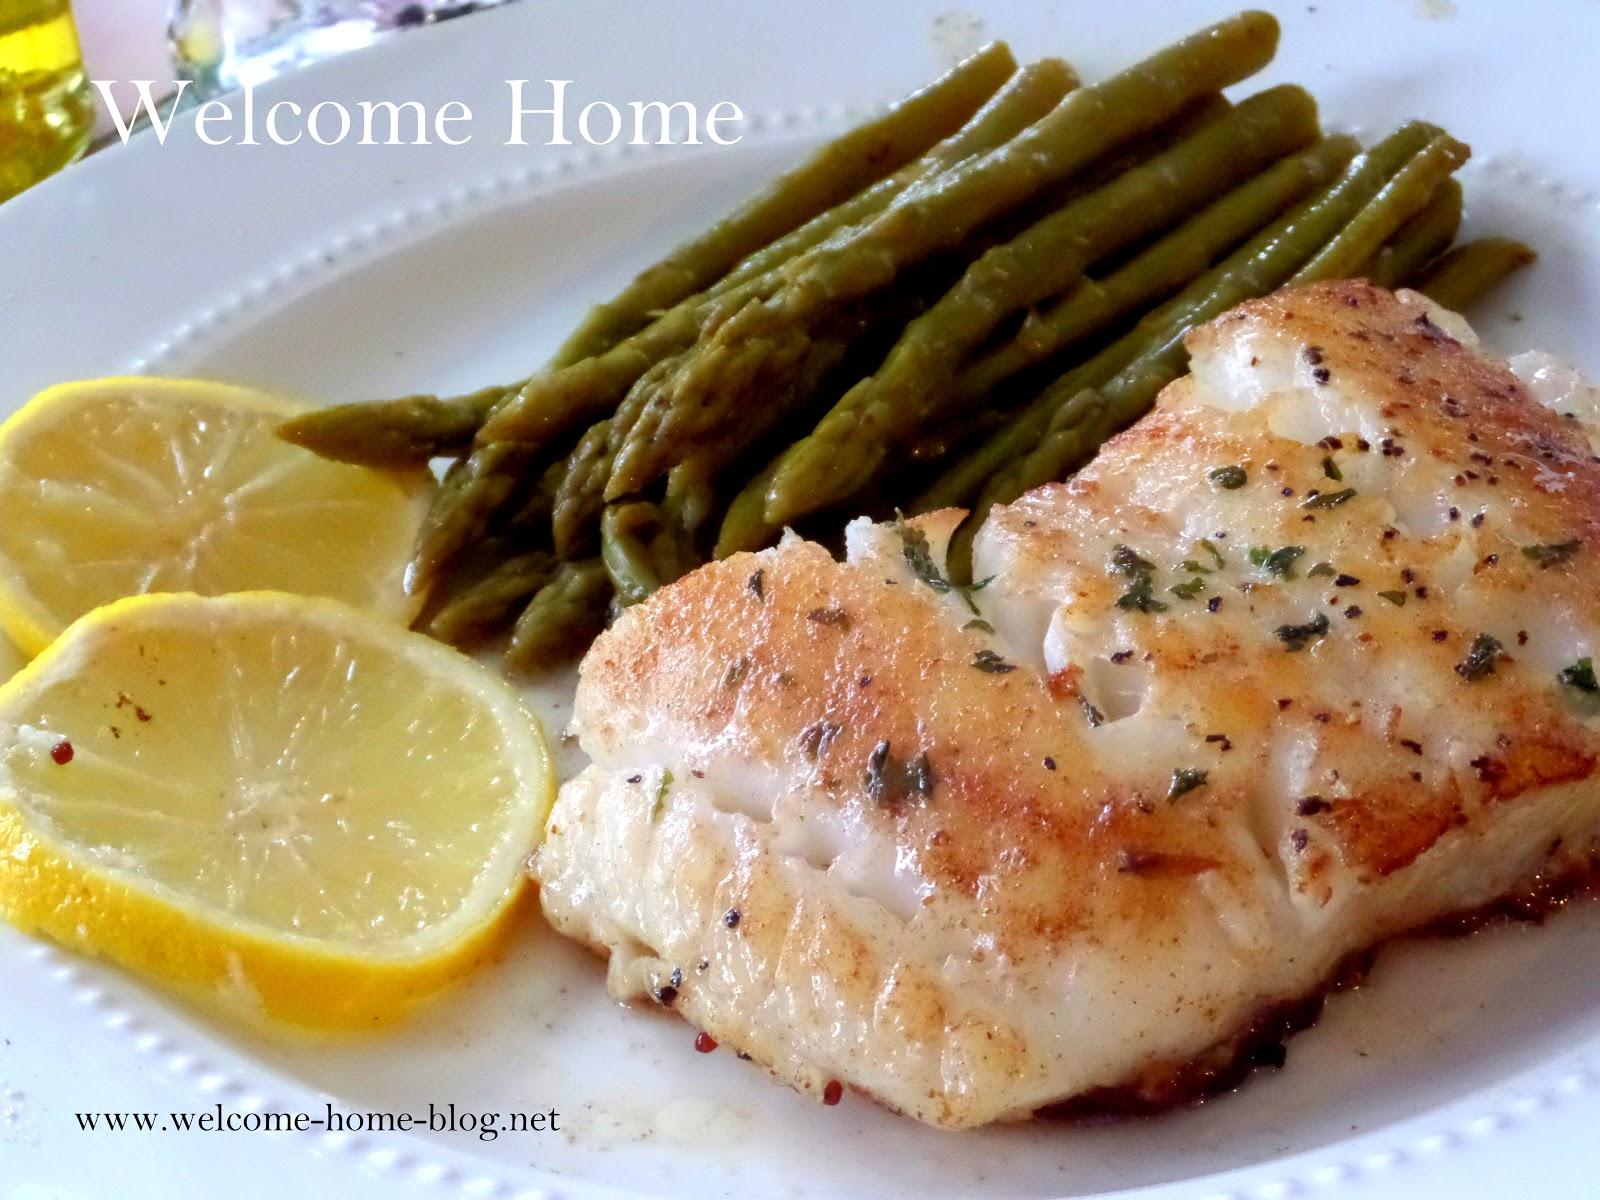 Welcome Home Blog: Pan Seared Chilean Sea Bass